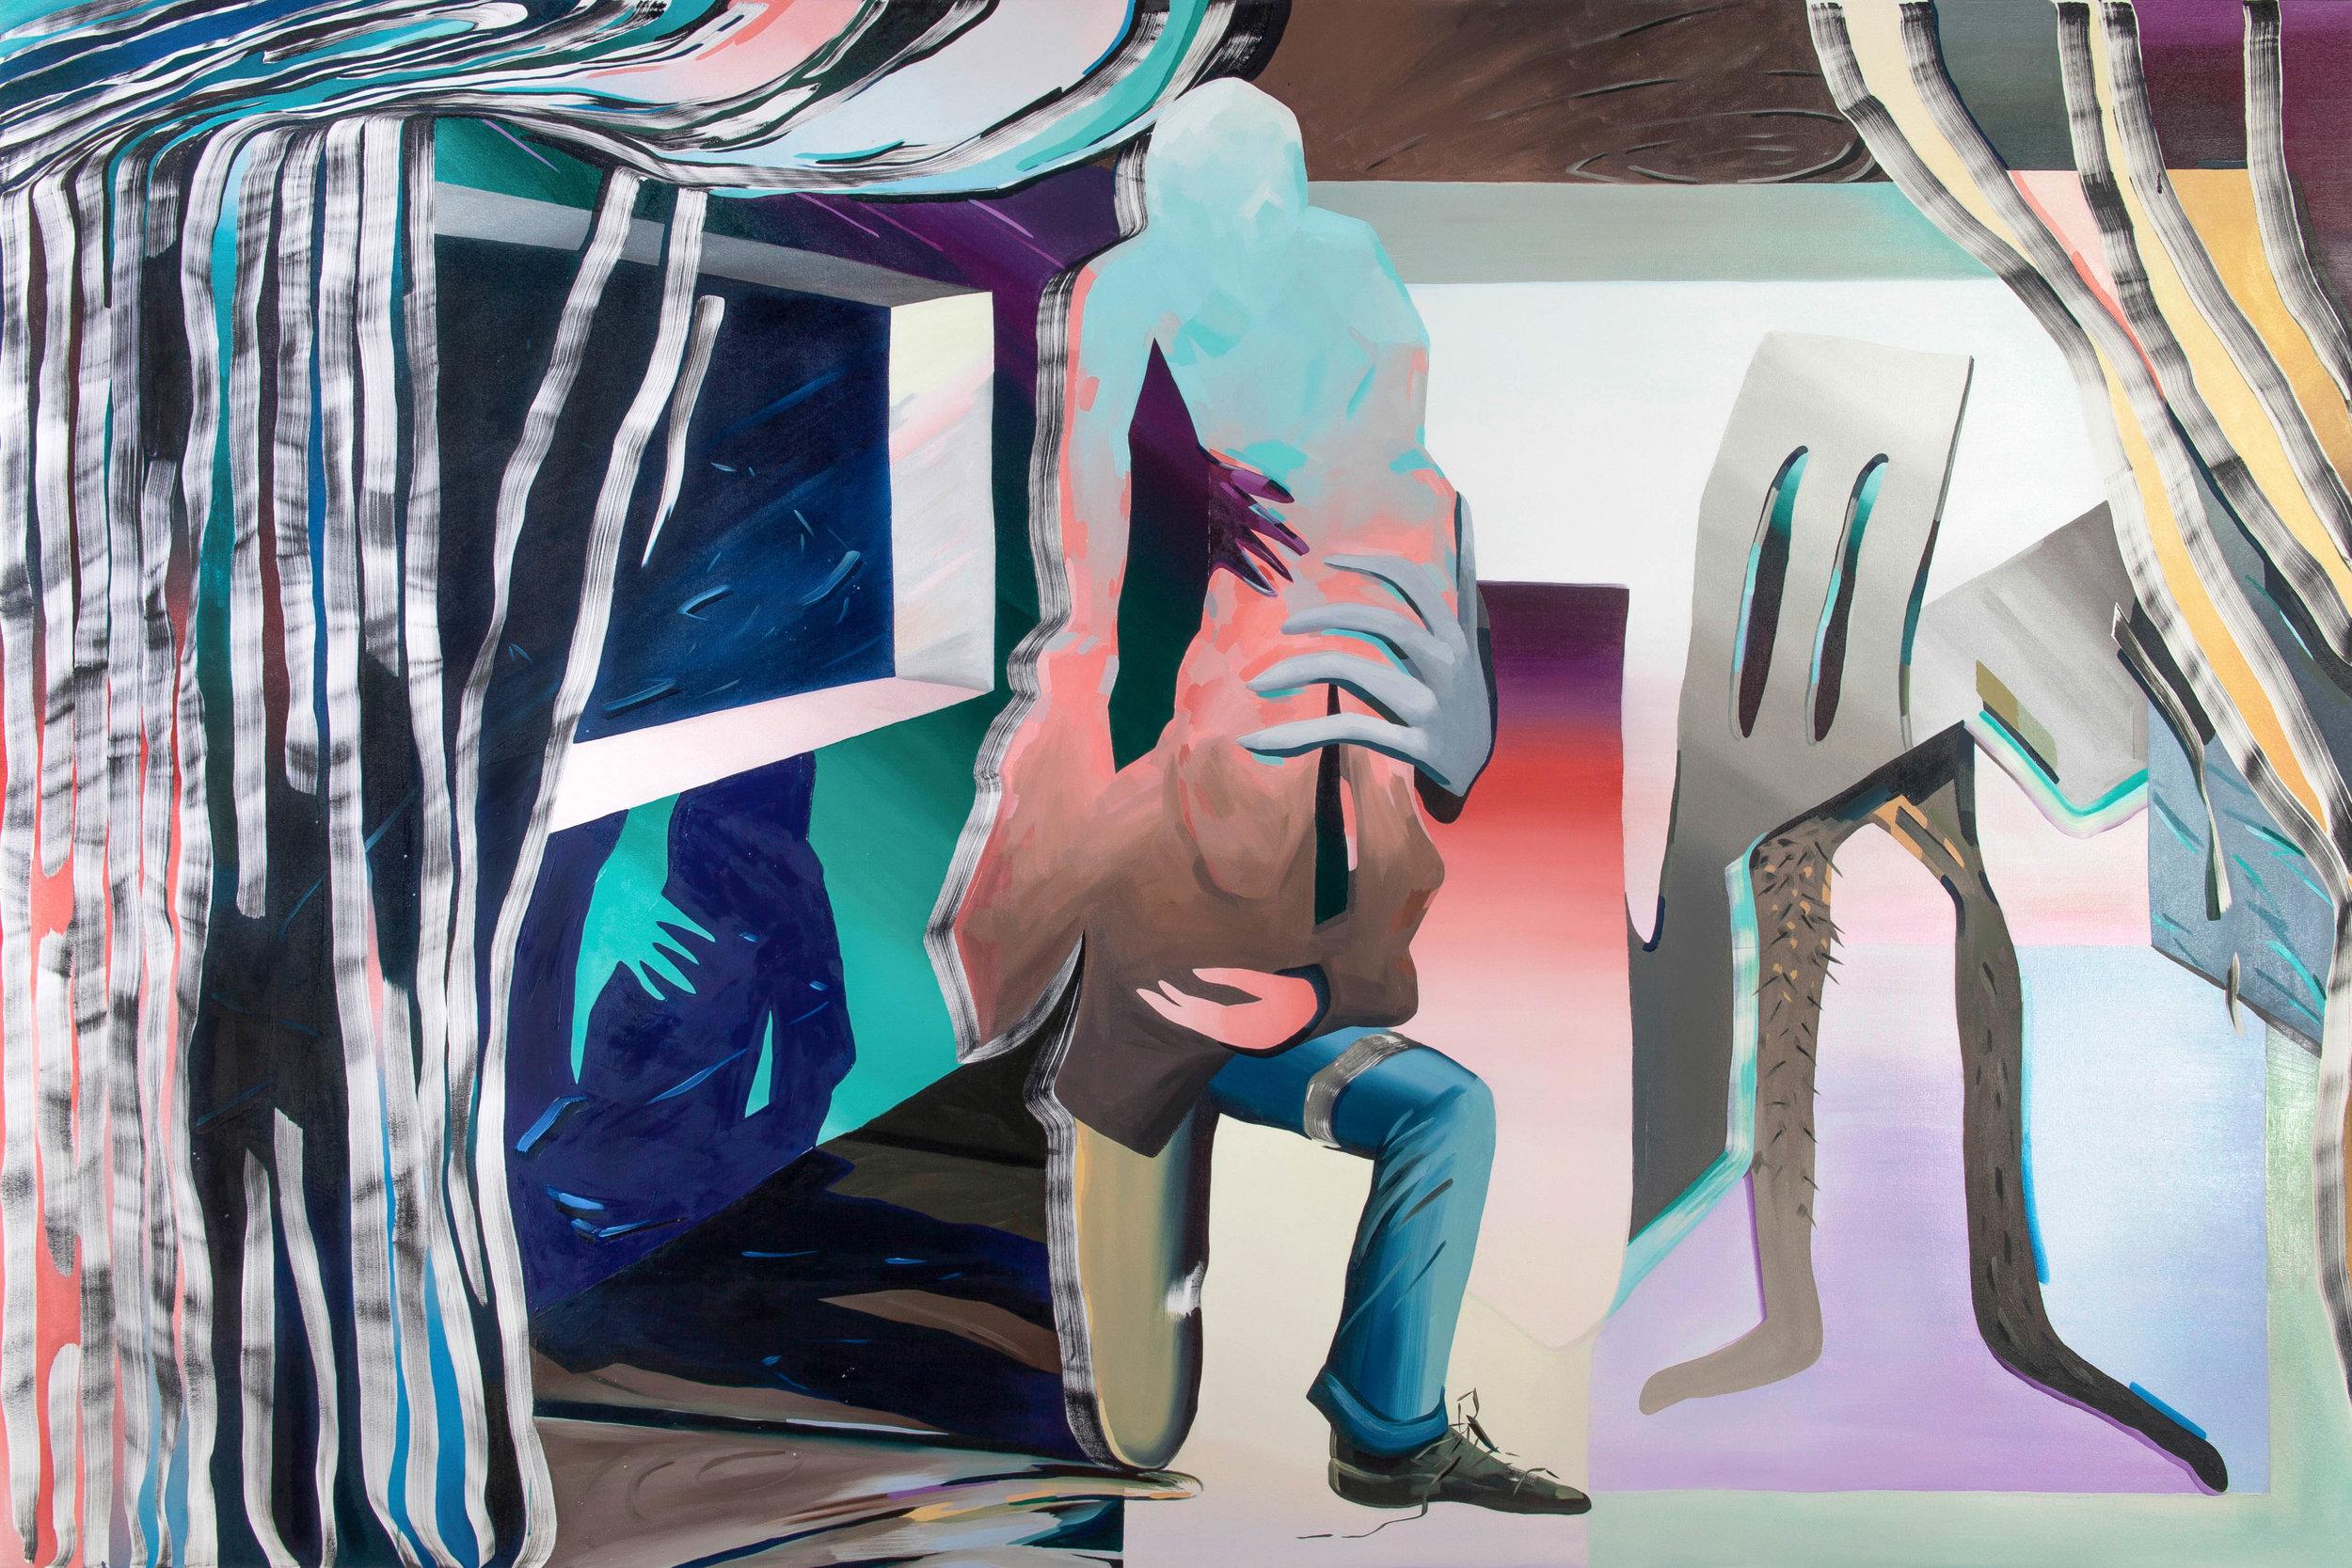 Karen Seapker , Congregate  (2016), oil on canvas, 72x108 inches.